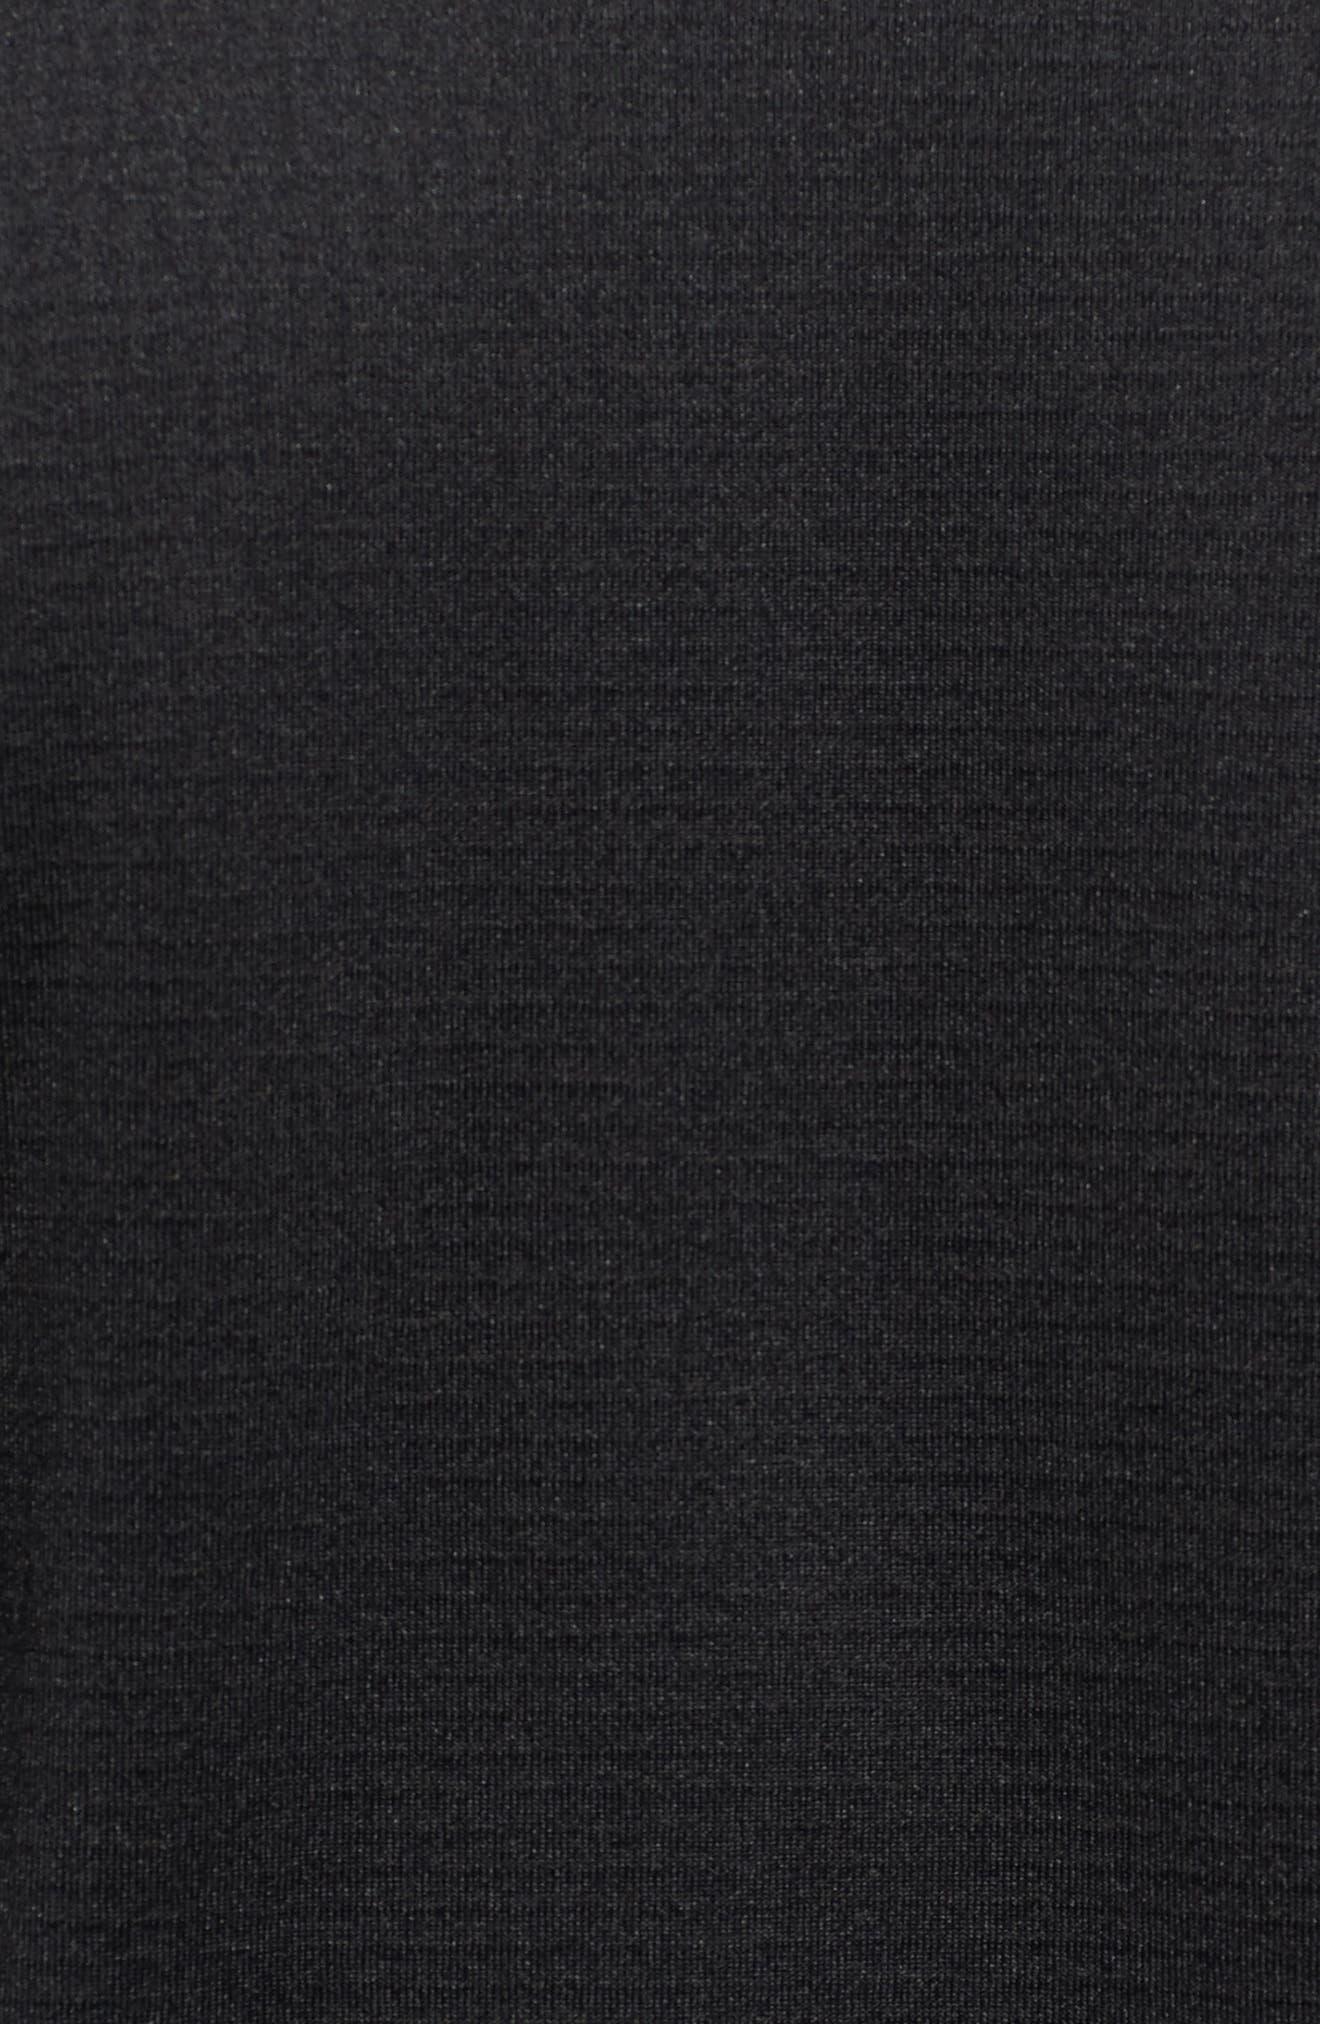 Borod Jacket,                             Alternate thumbnail 5, color,                             Tnf Black/ Tnf Black